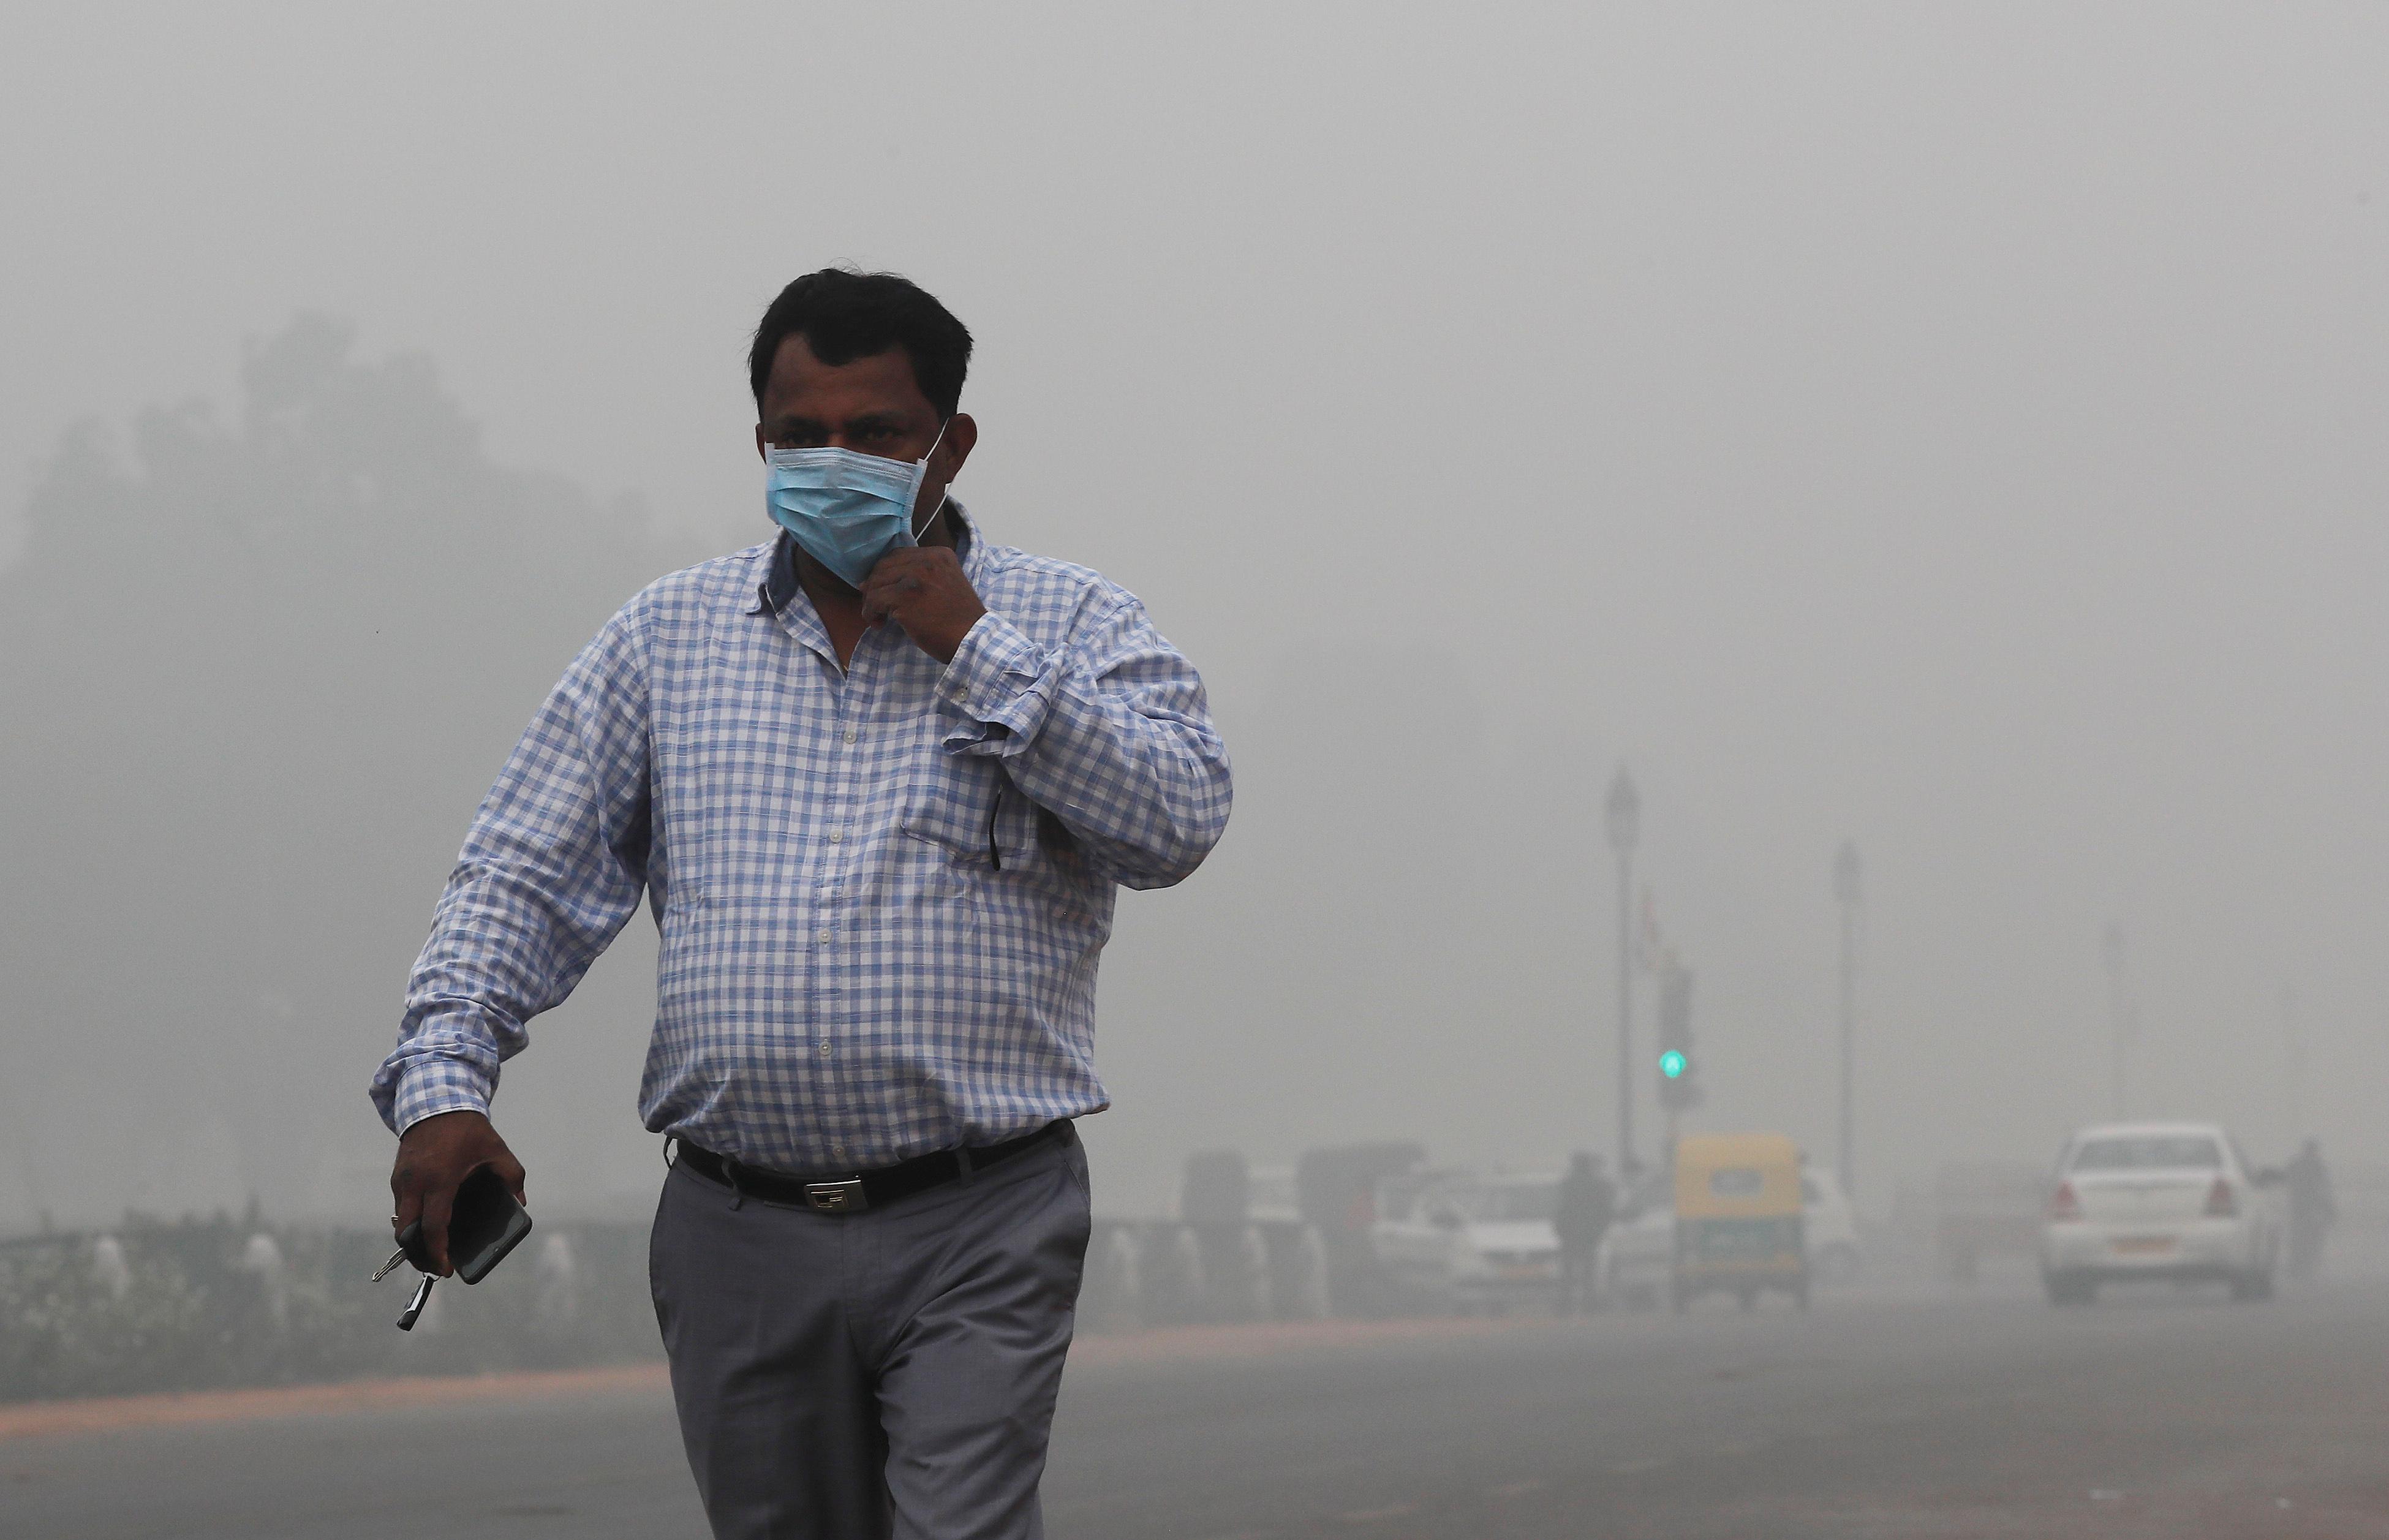 India's Far Hazardous Suffers This Most Smog-bound So Air Capital